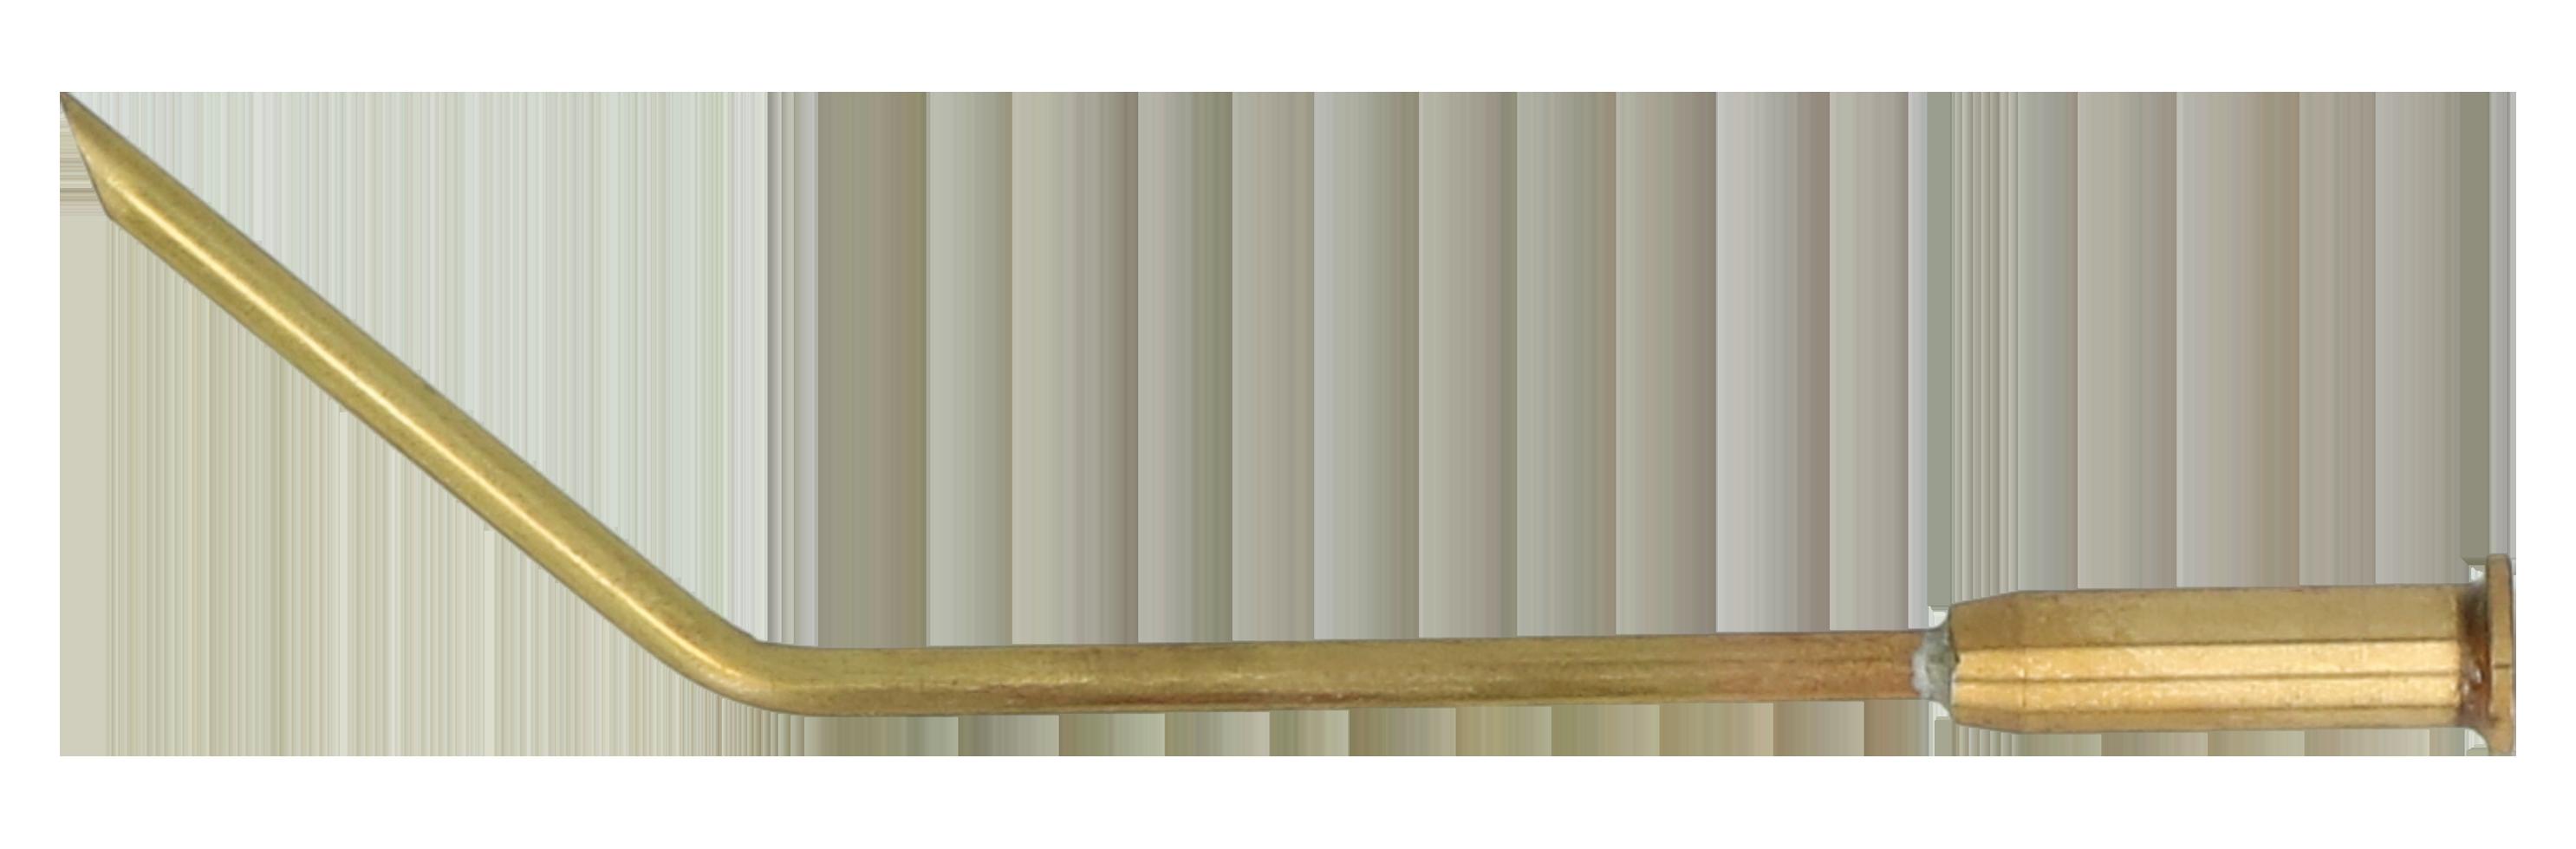 Hofman Birchmeier Gebogen Spuitlans 15 cm DR5